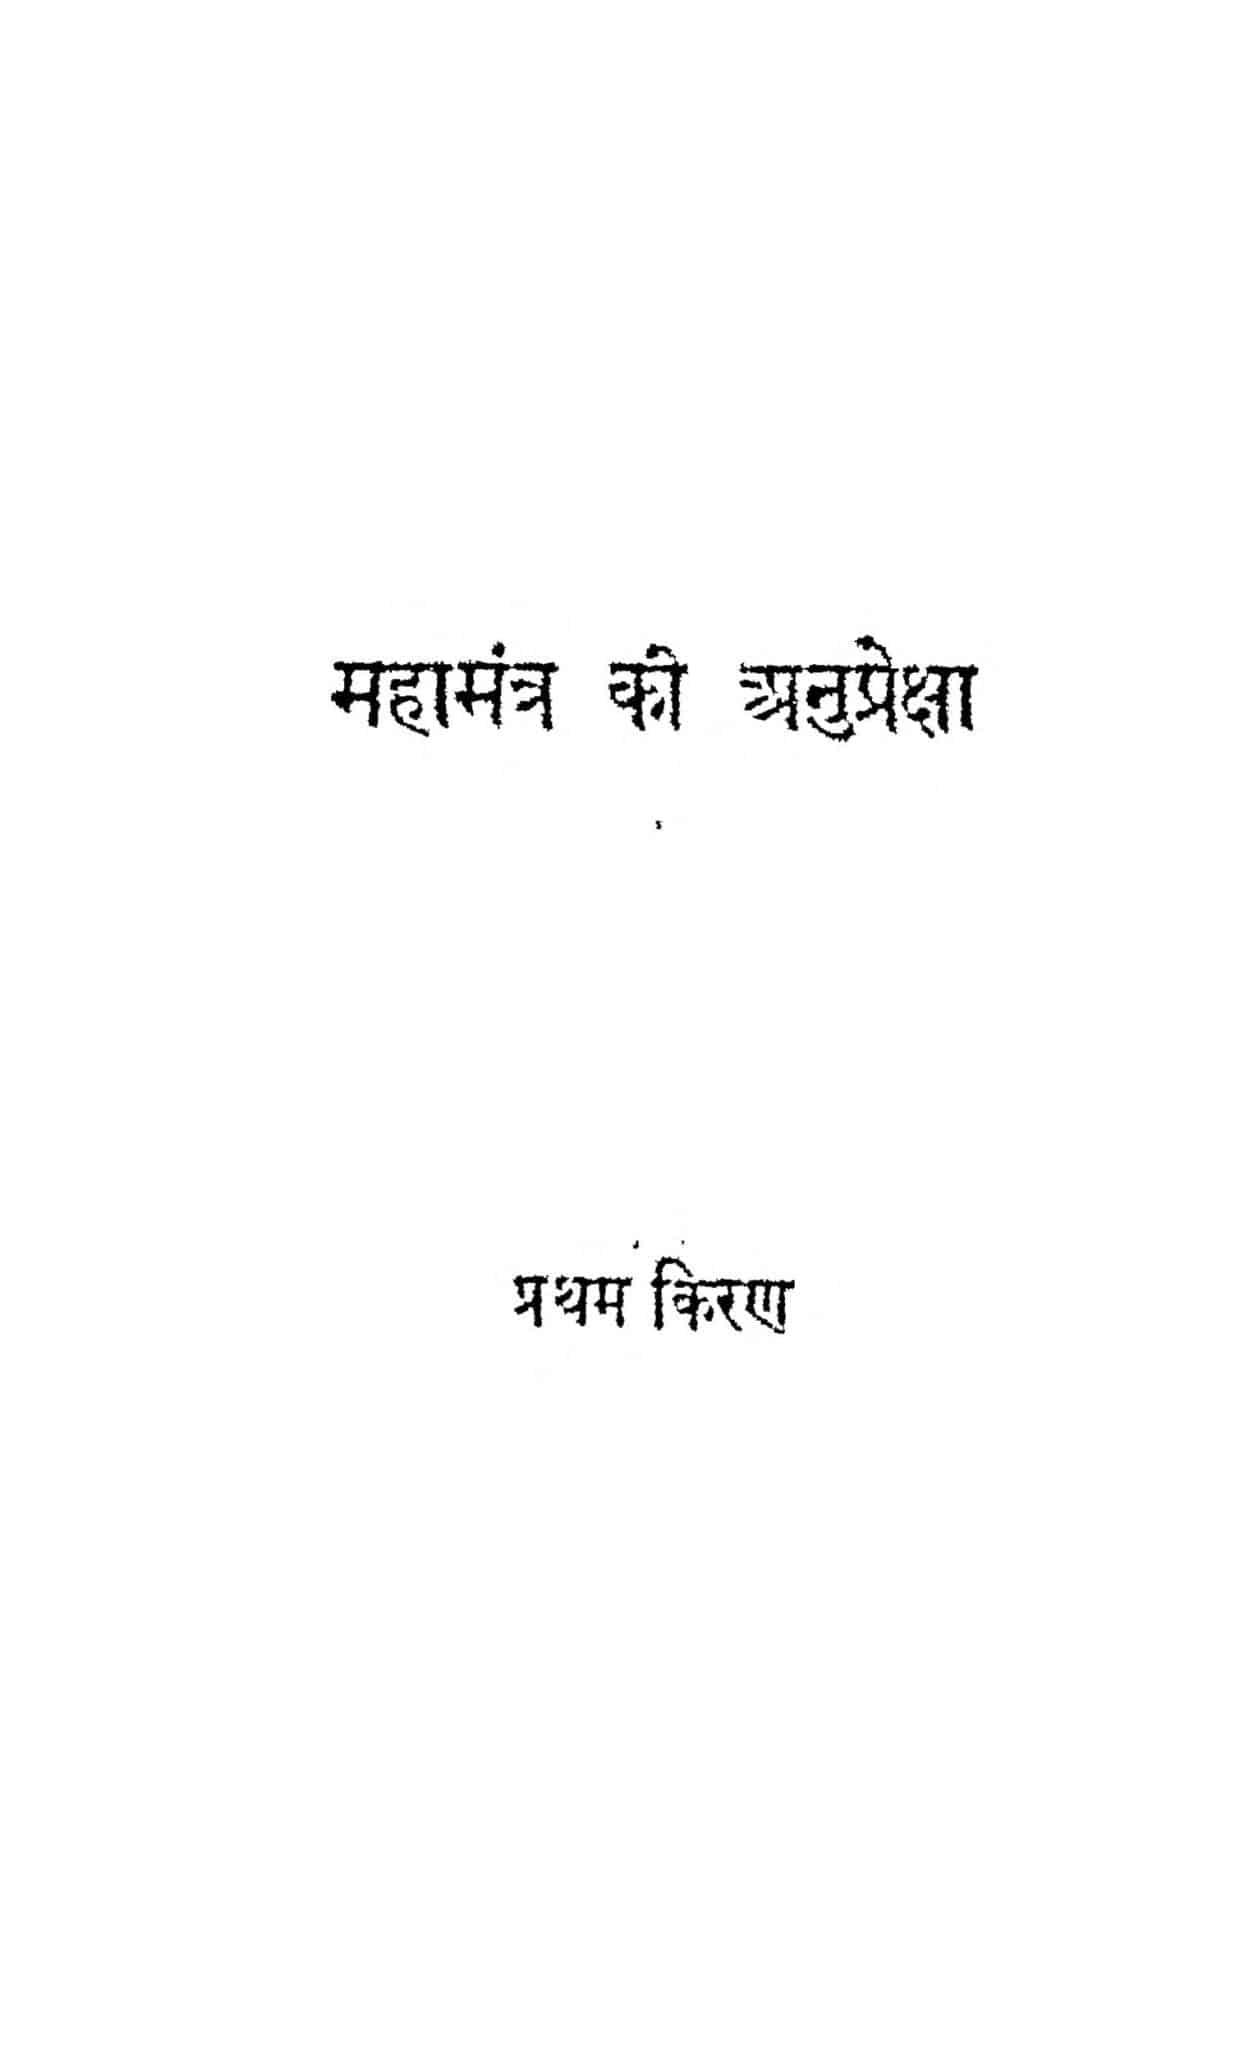 Mahamantra Ki Anupreksha by सोहनलाल पटनी - Sohanlal Patani